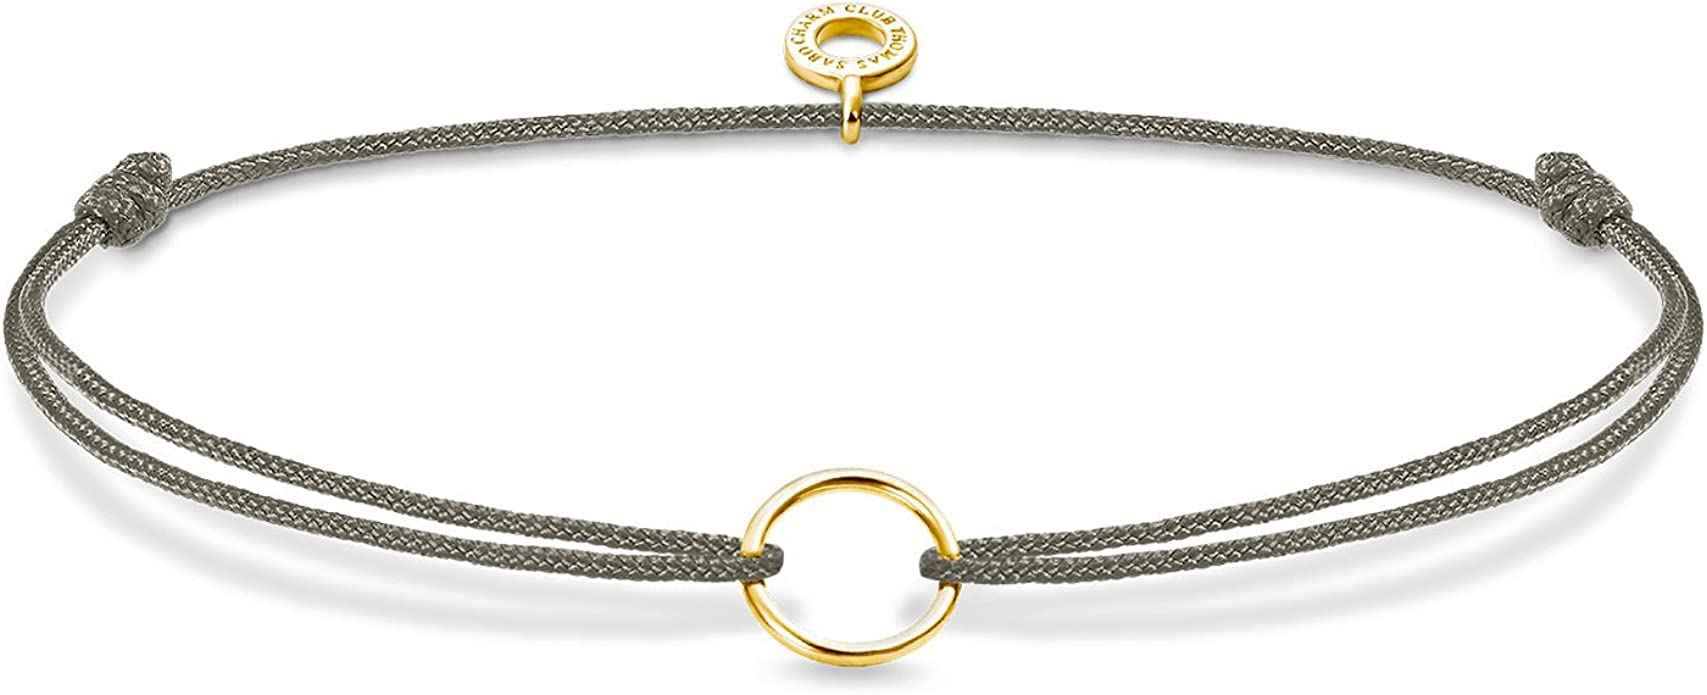 "THOMAS SABO Armband /""Little Secret Kreis/"" Silber vergoldet grau LS067-848-5"